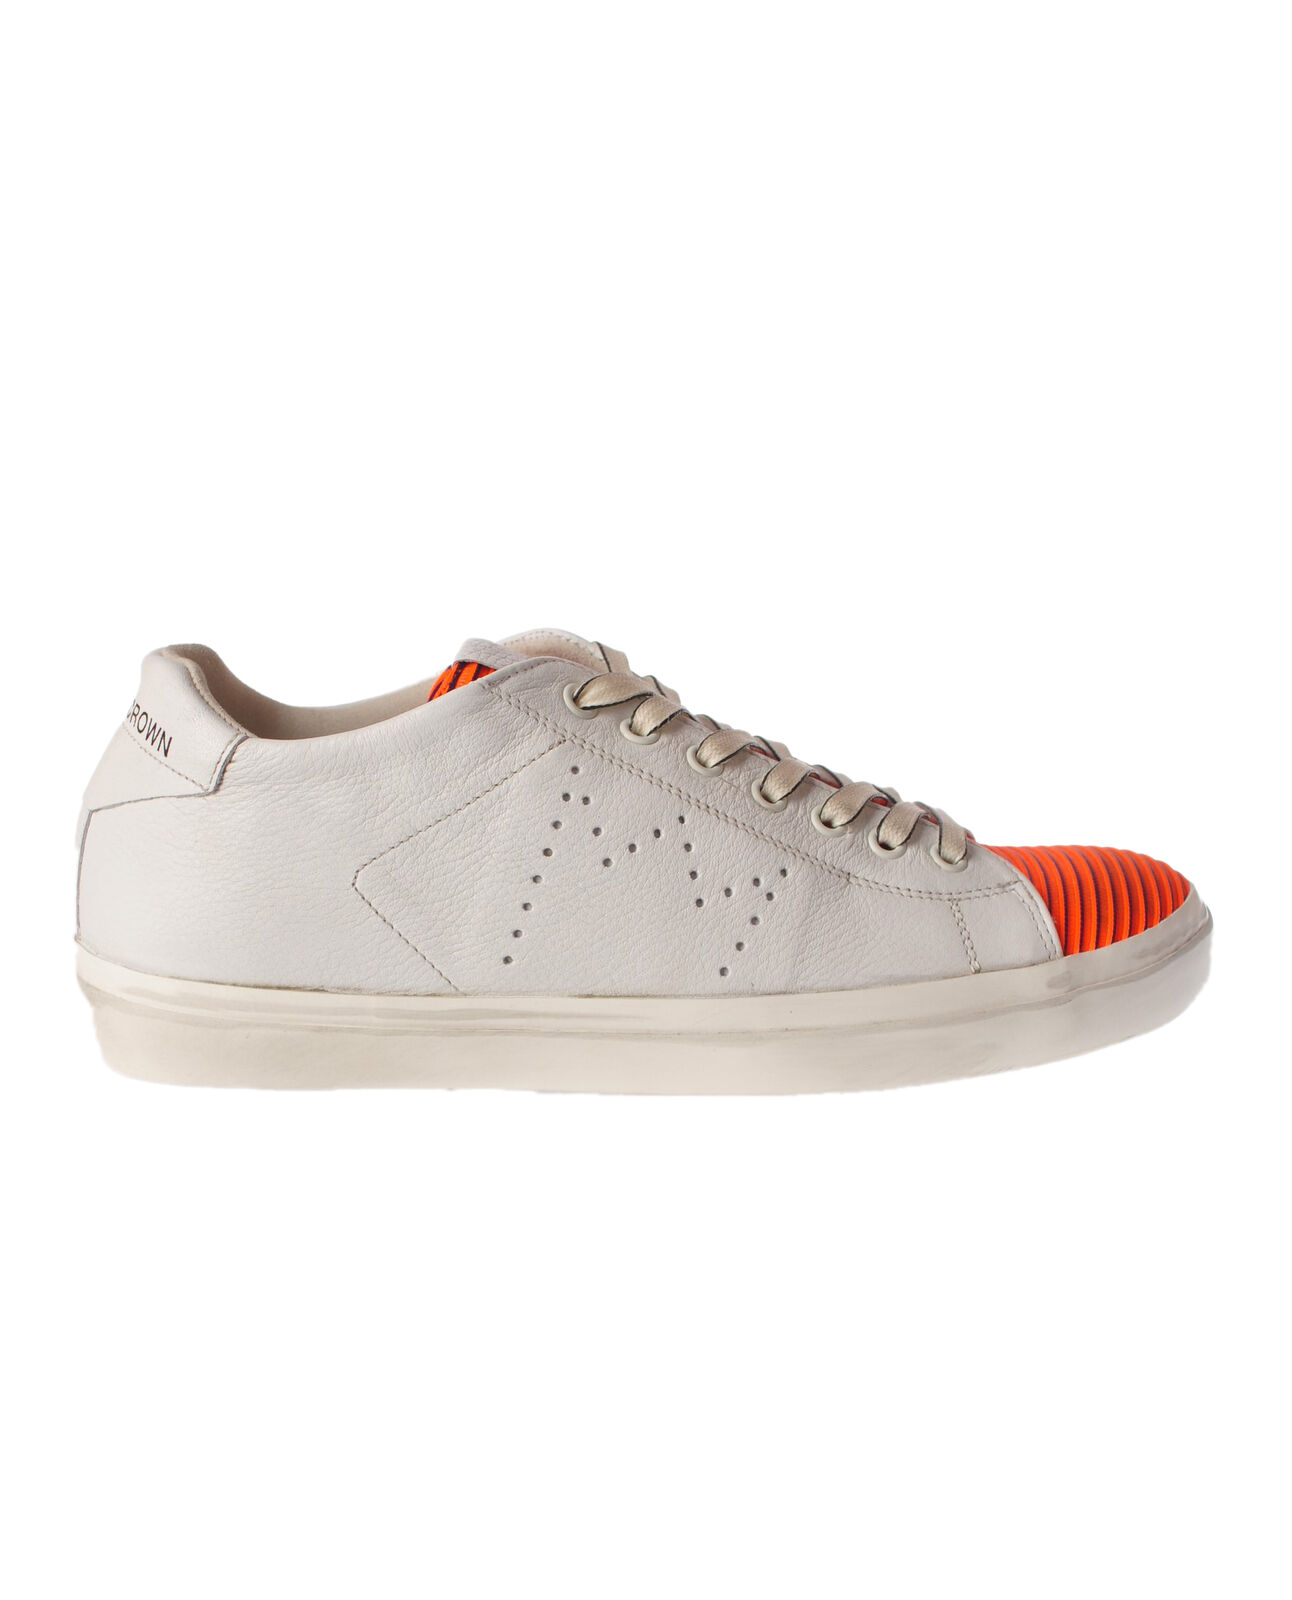 Leather Crown - scarpe-scarpe da ginnastica low - Man - bianca - 4751106C195018